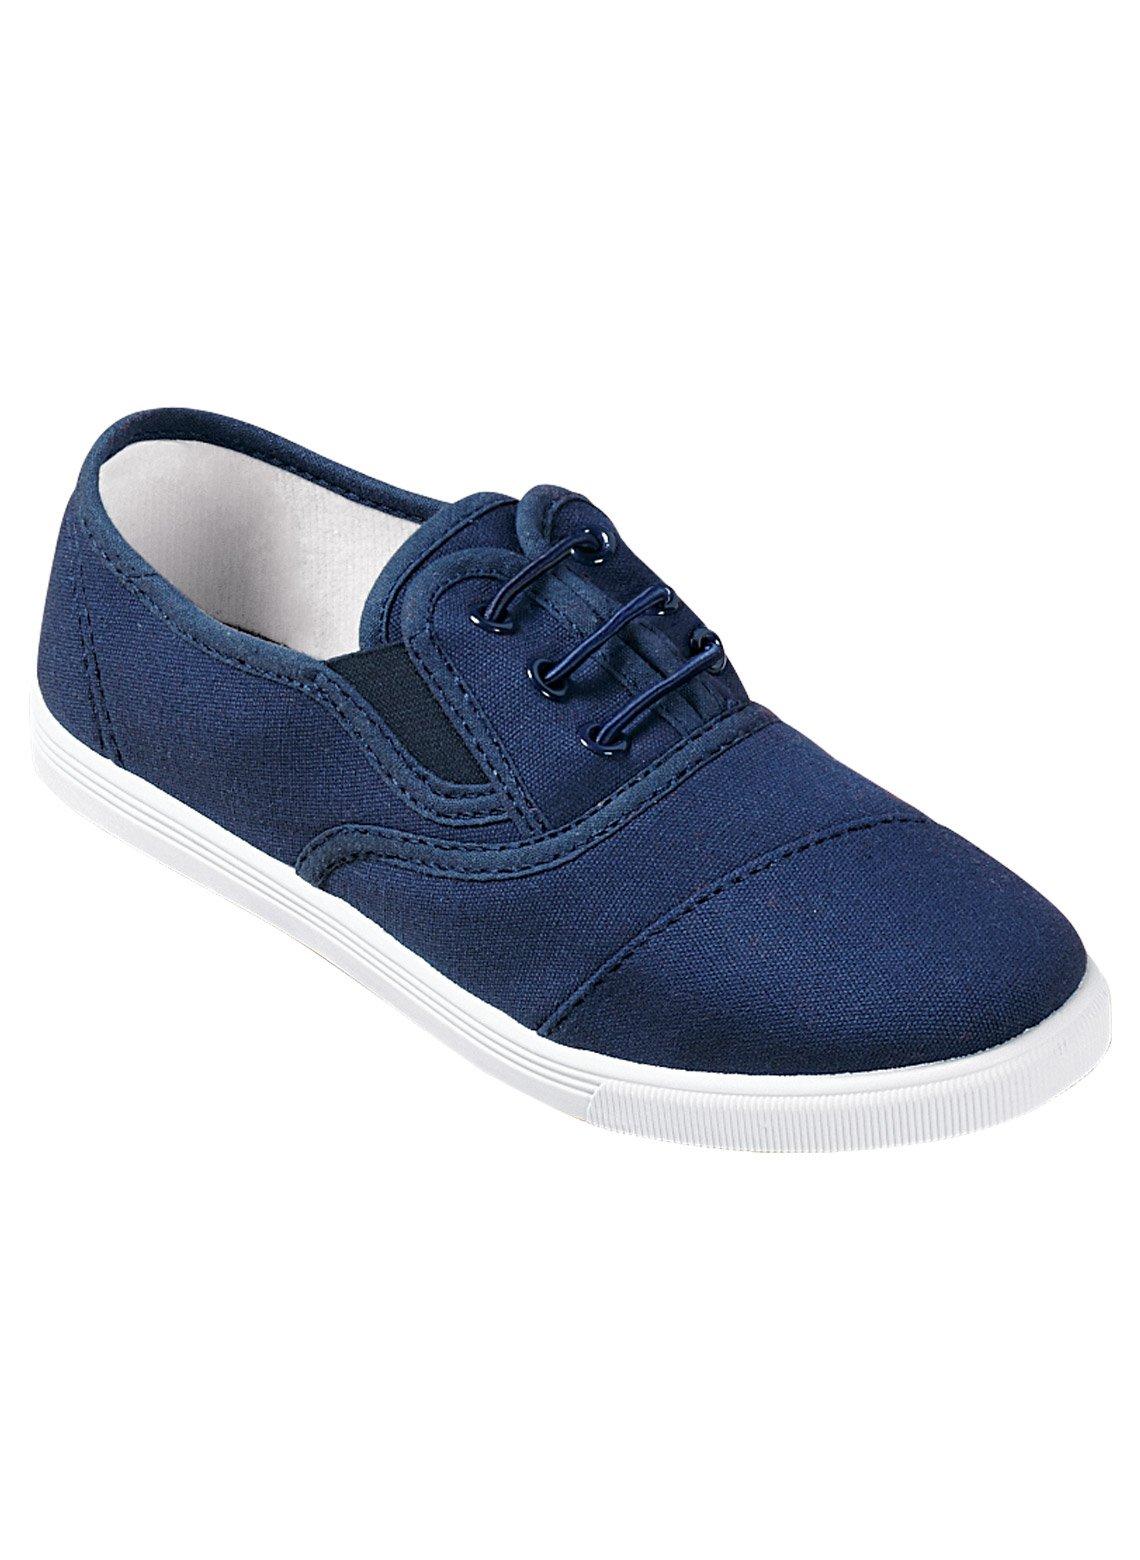 Carol Wright Gifts No-Tie Sneaker, Navy, Size 7-1/2 (Medium)